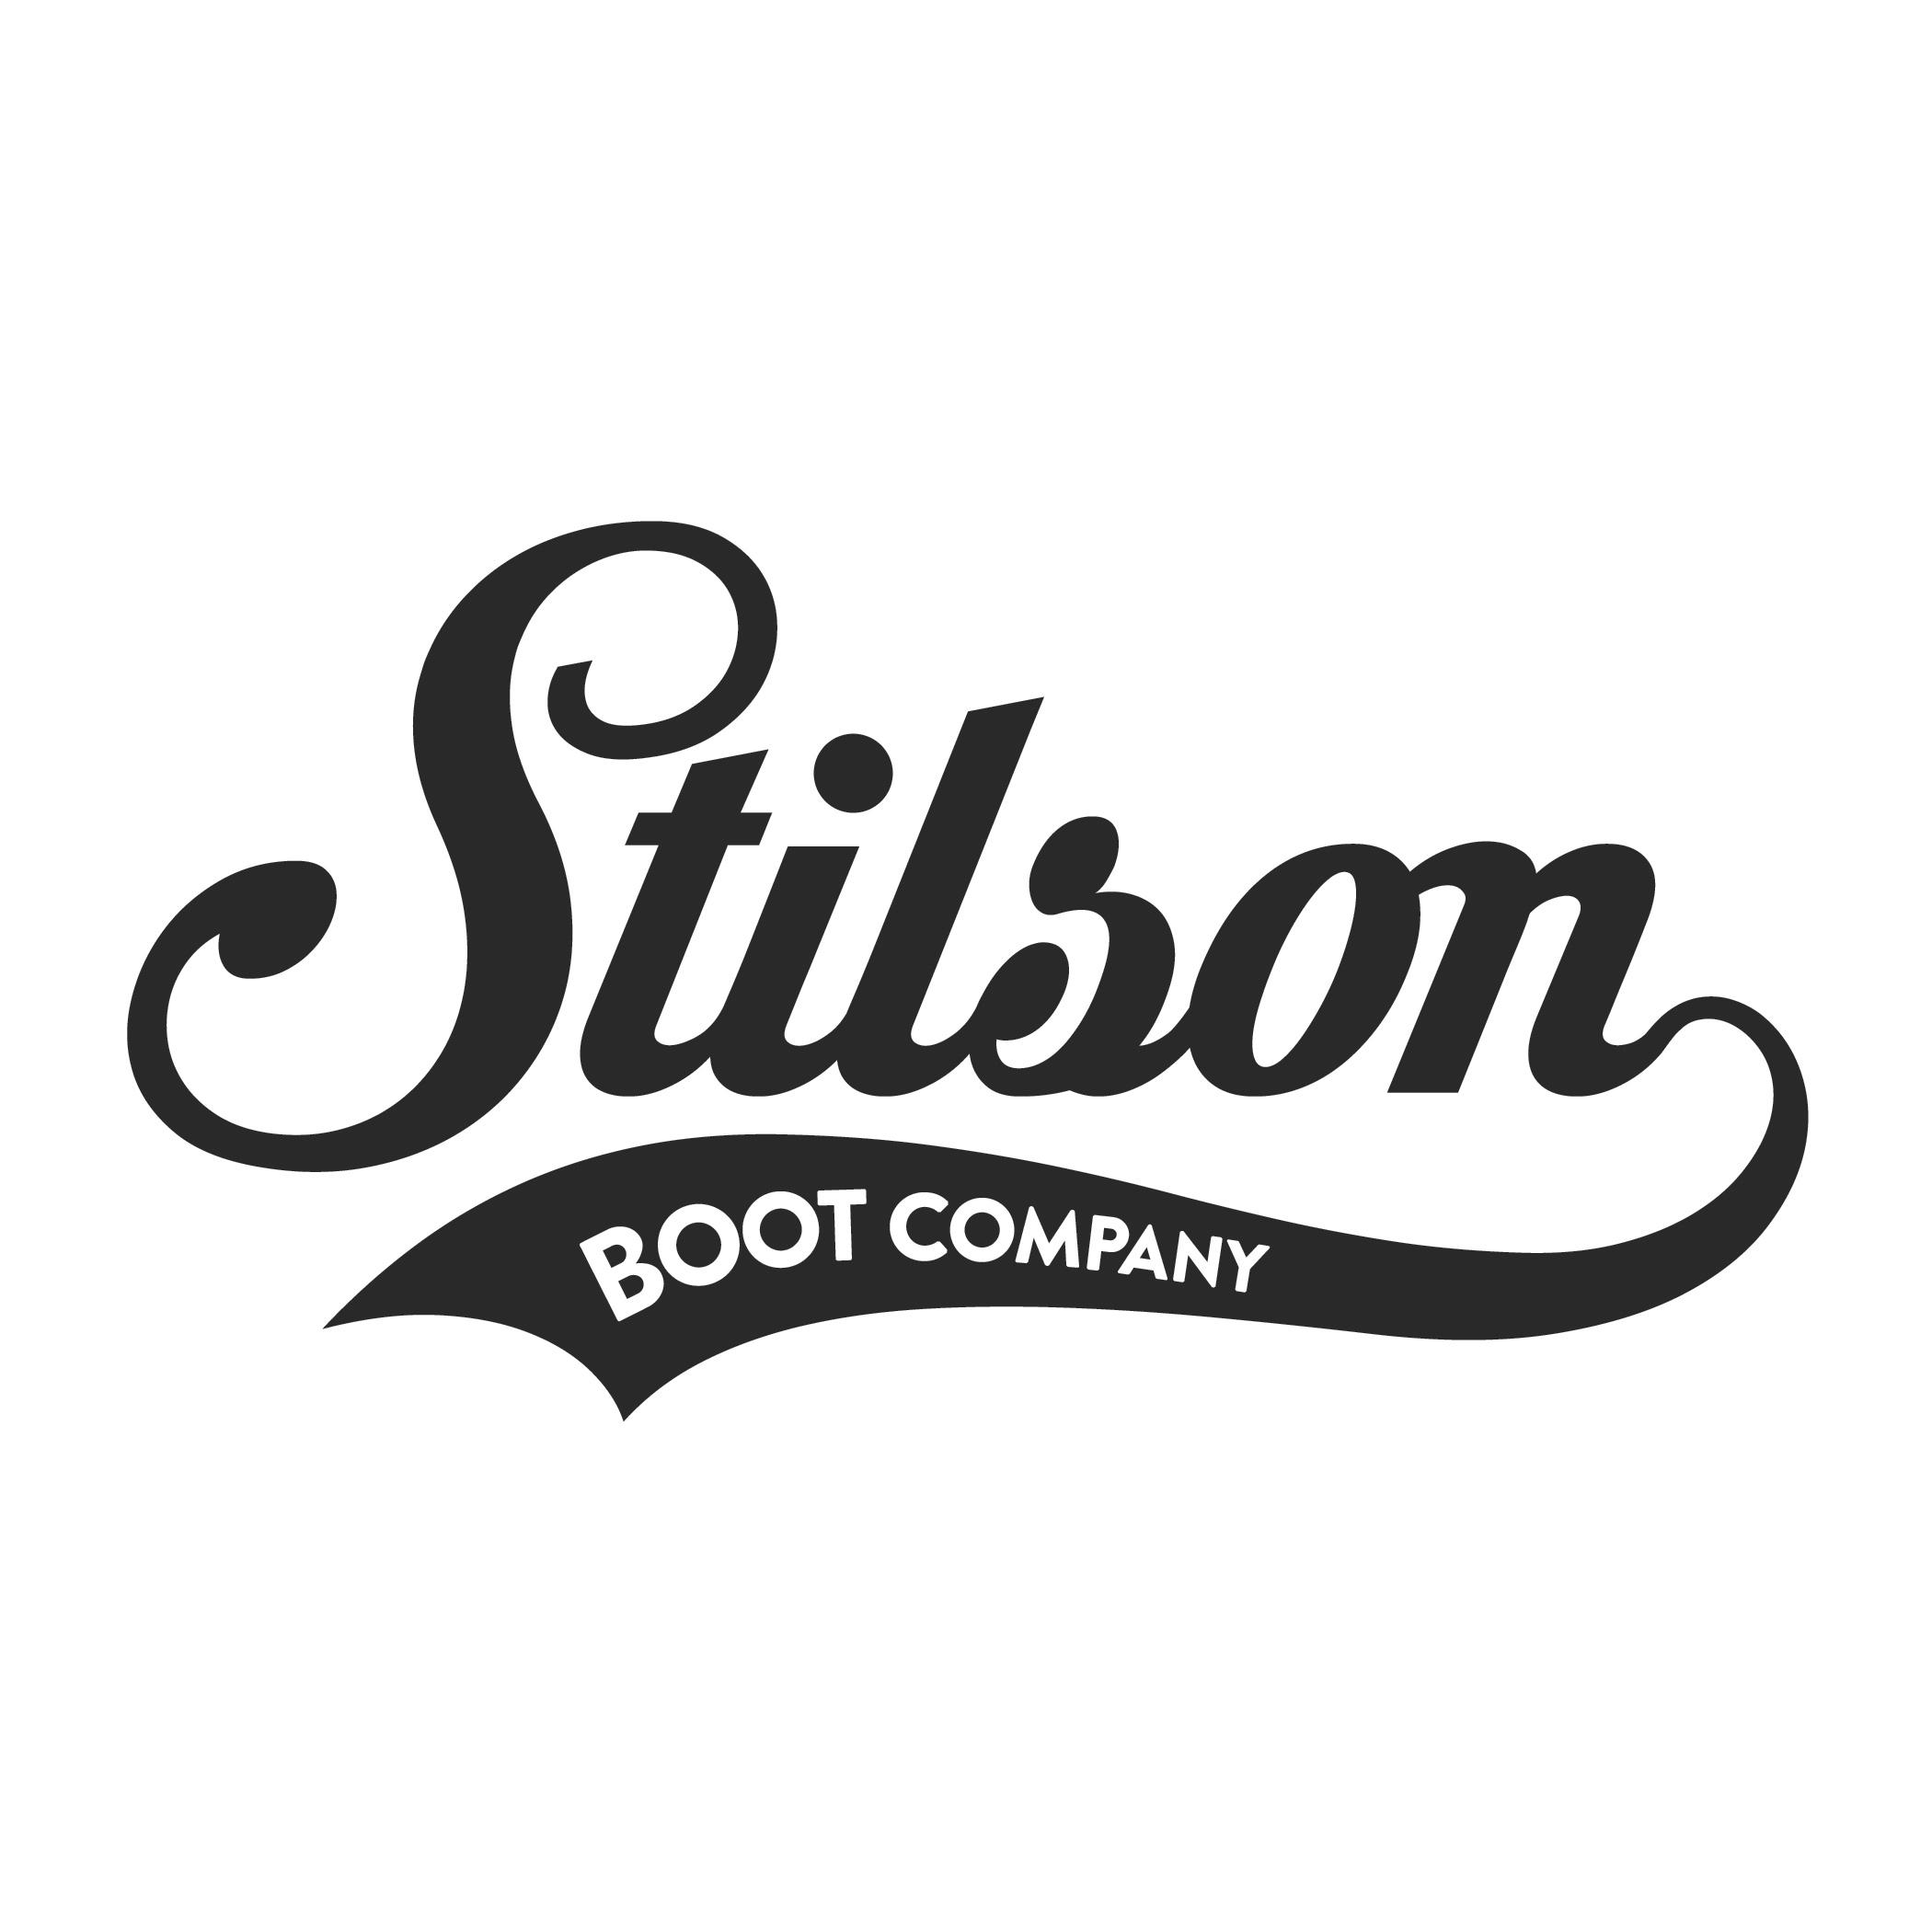 Final Stilson Script logo_84.jpg